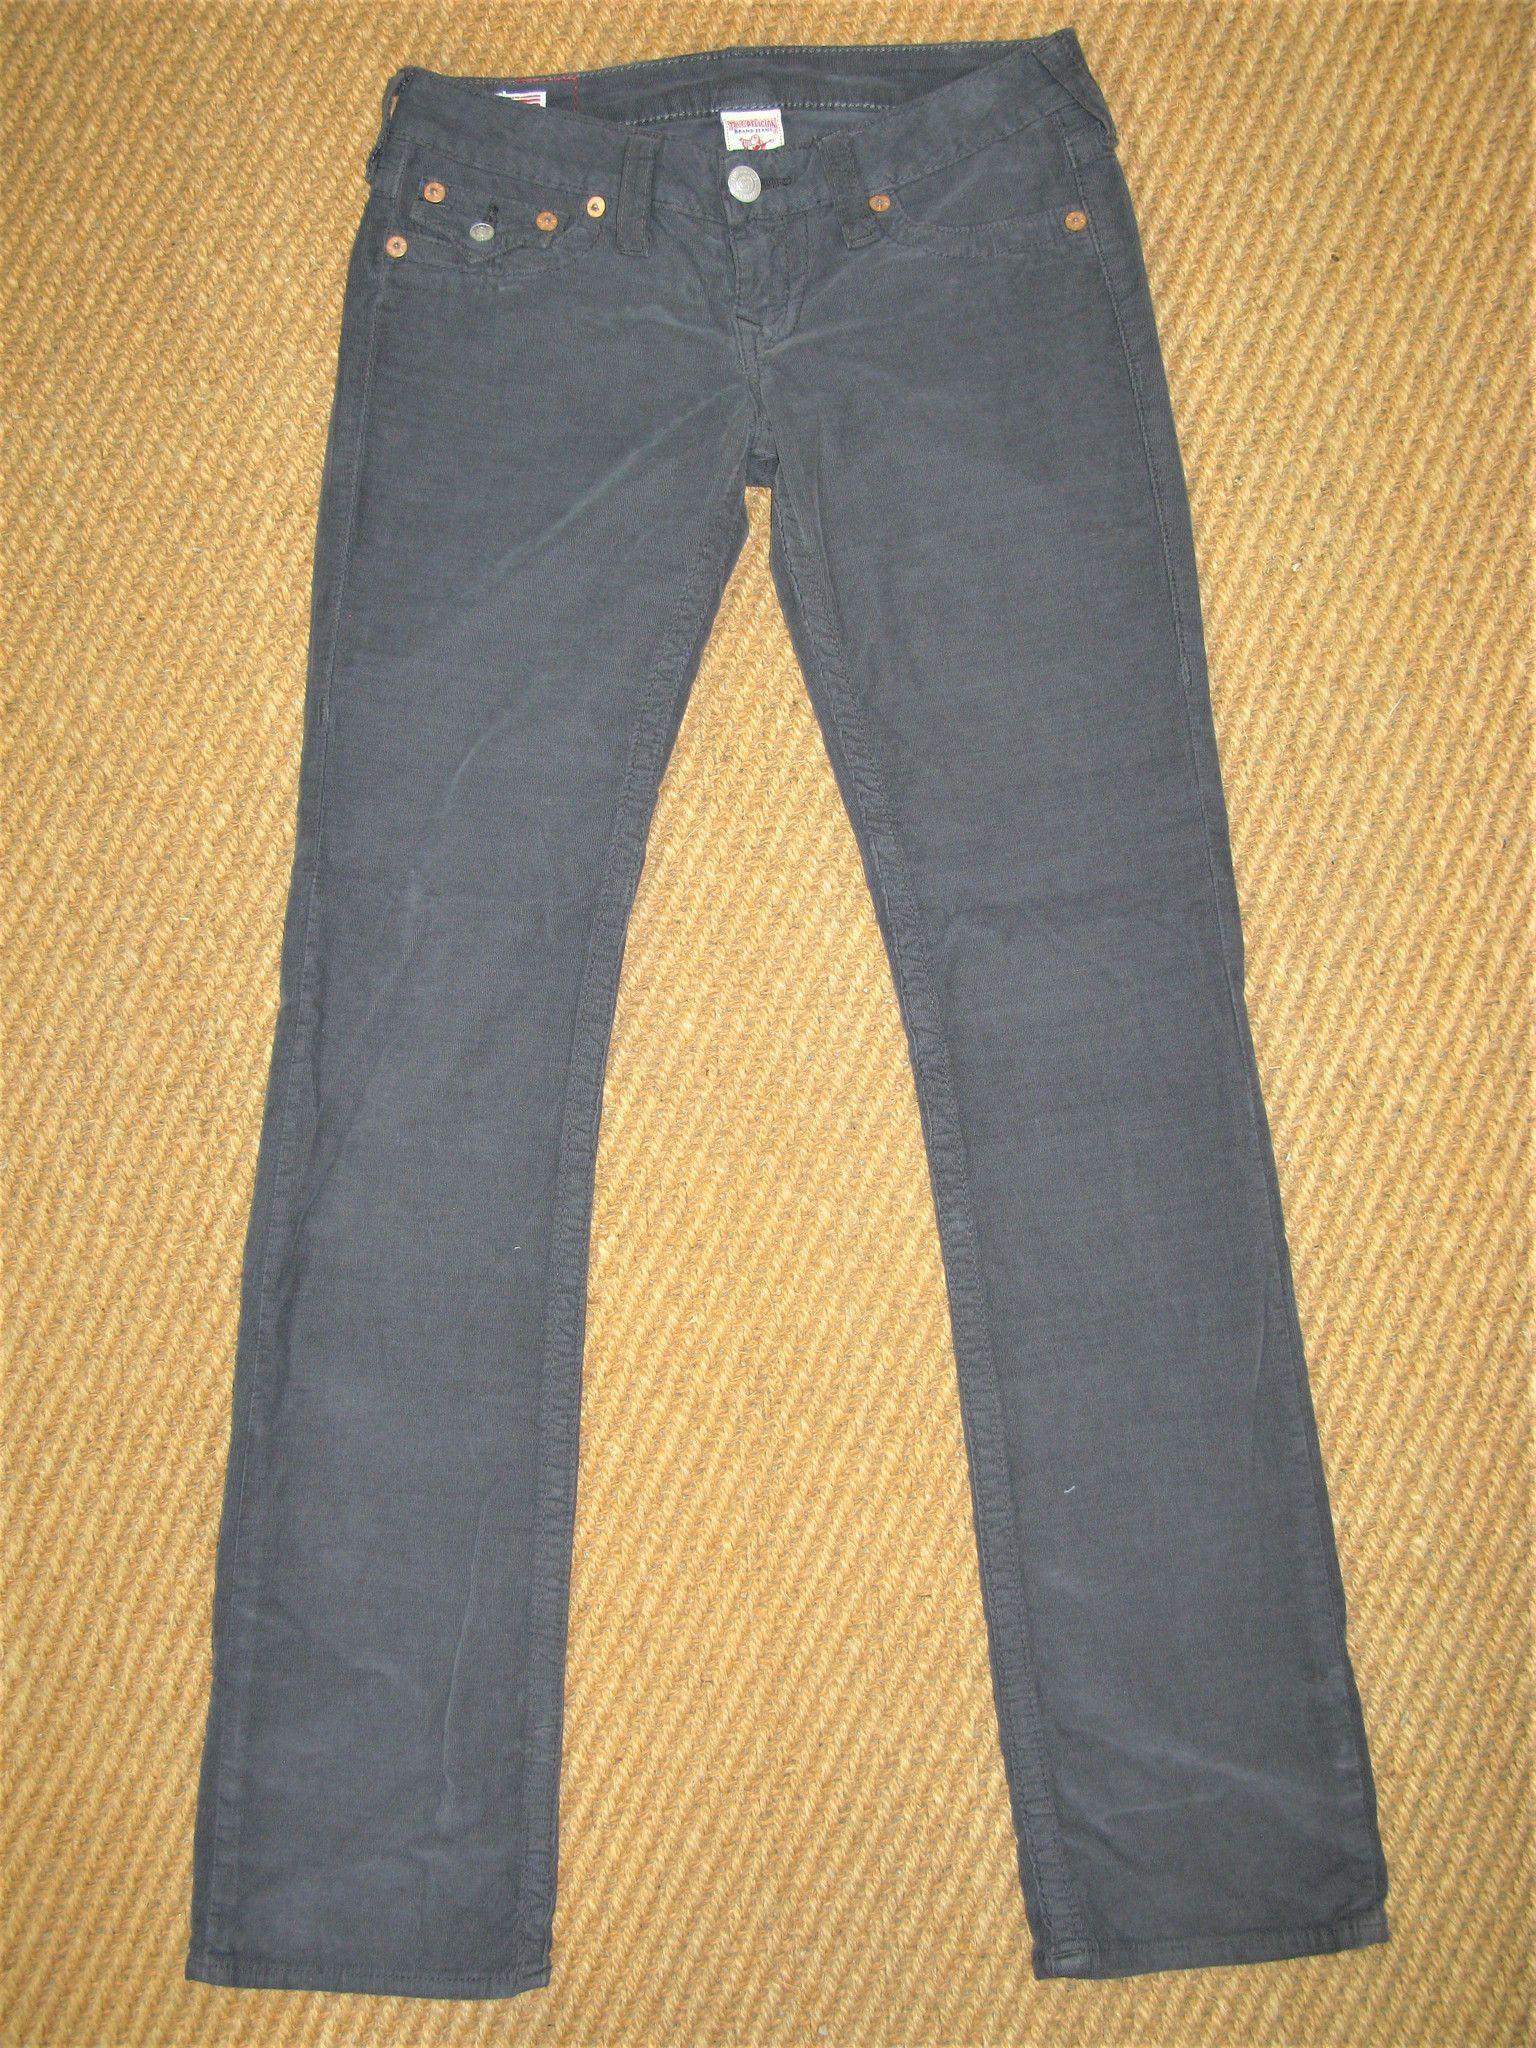 True Religion Billy Micro Cord Slim Straight Lowrise Jeans 27 NWOT